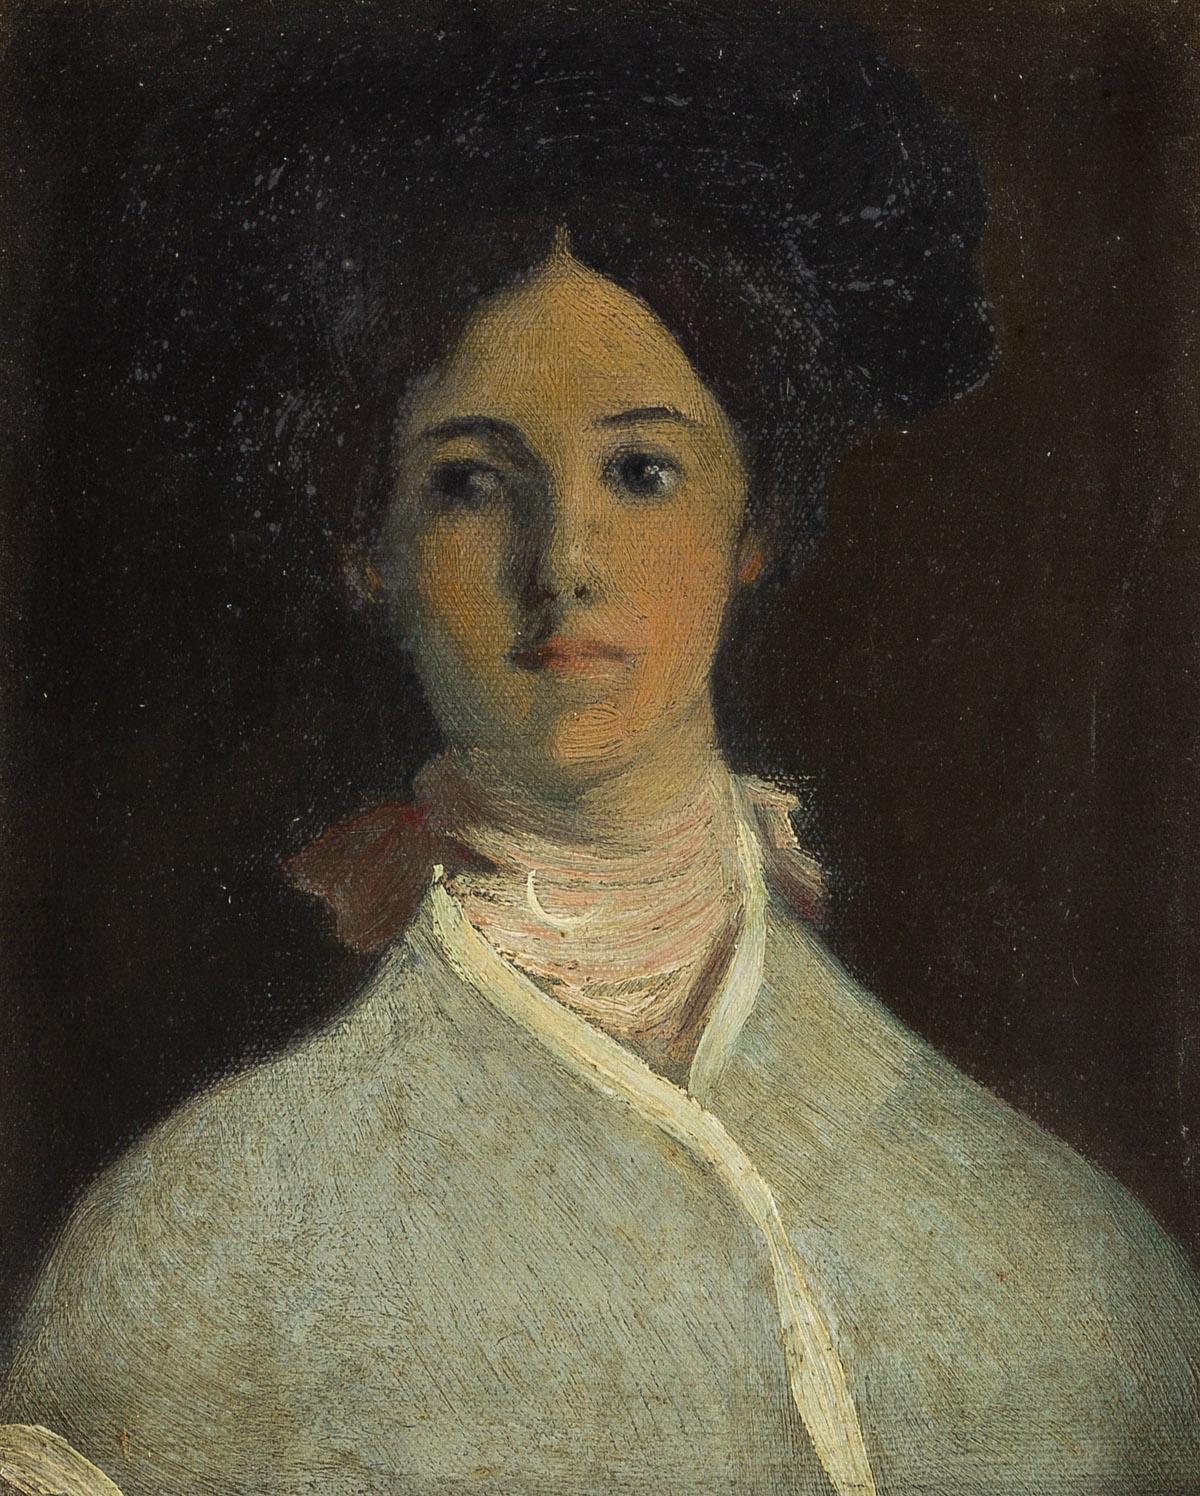 ARTHUR B. DAVIES (1862-1928) Portrait of a Woman.